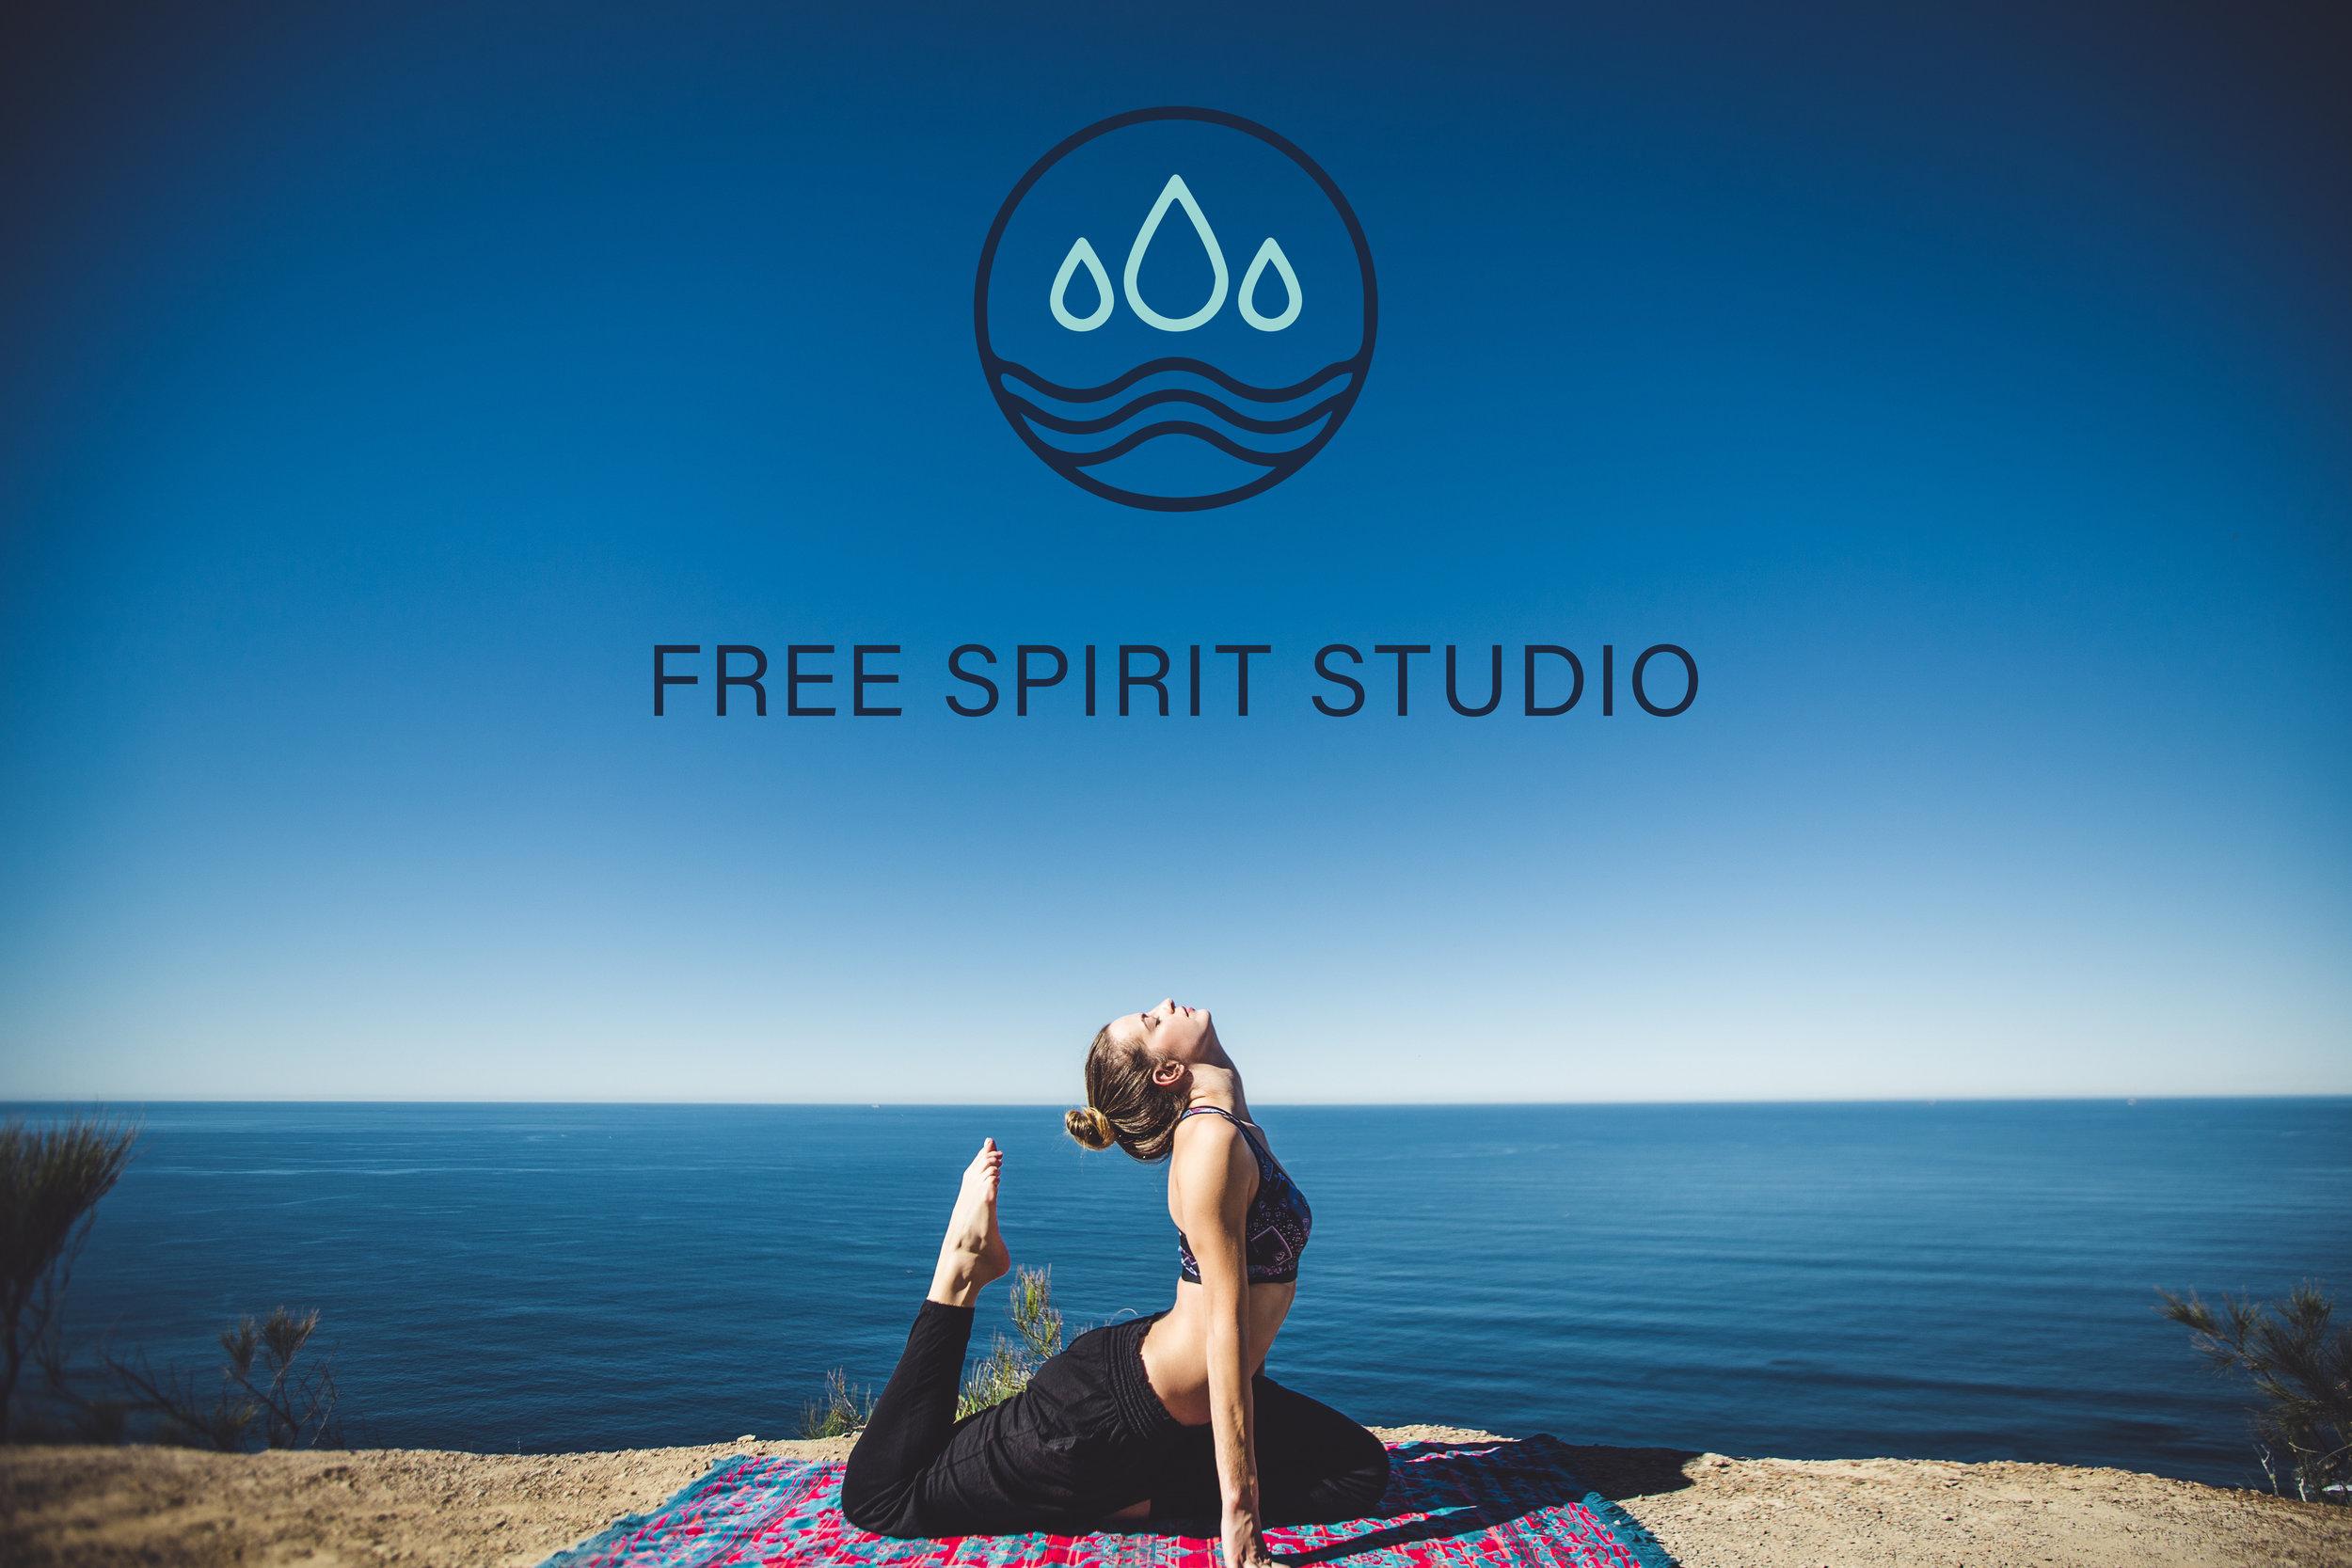 FreeSpiritStudio.png